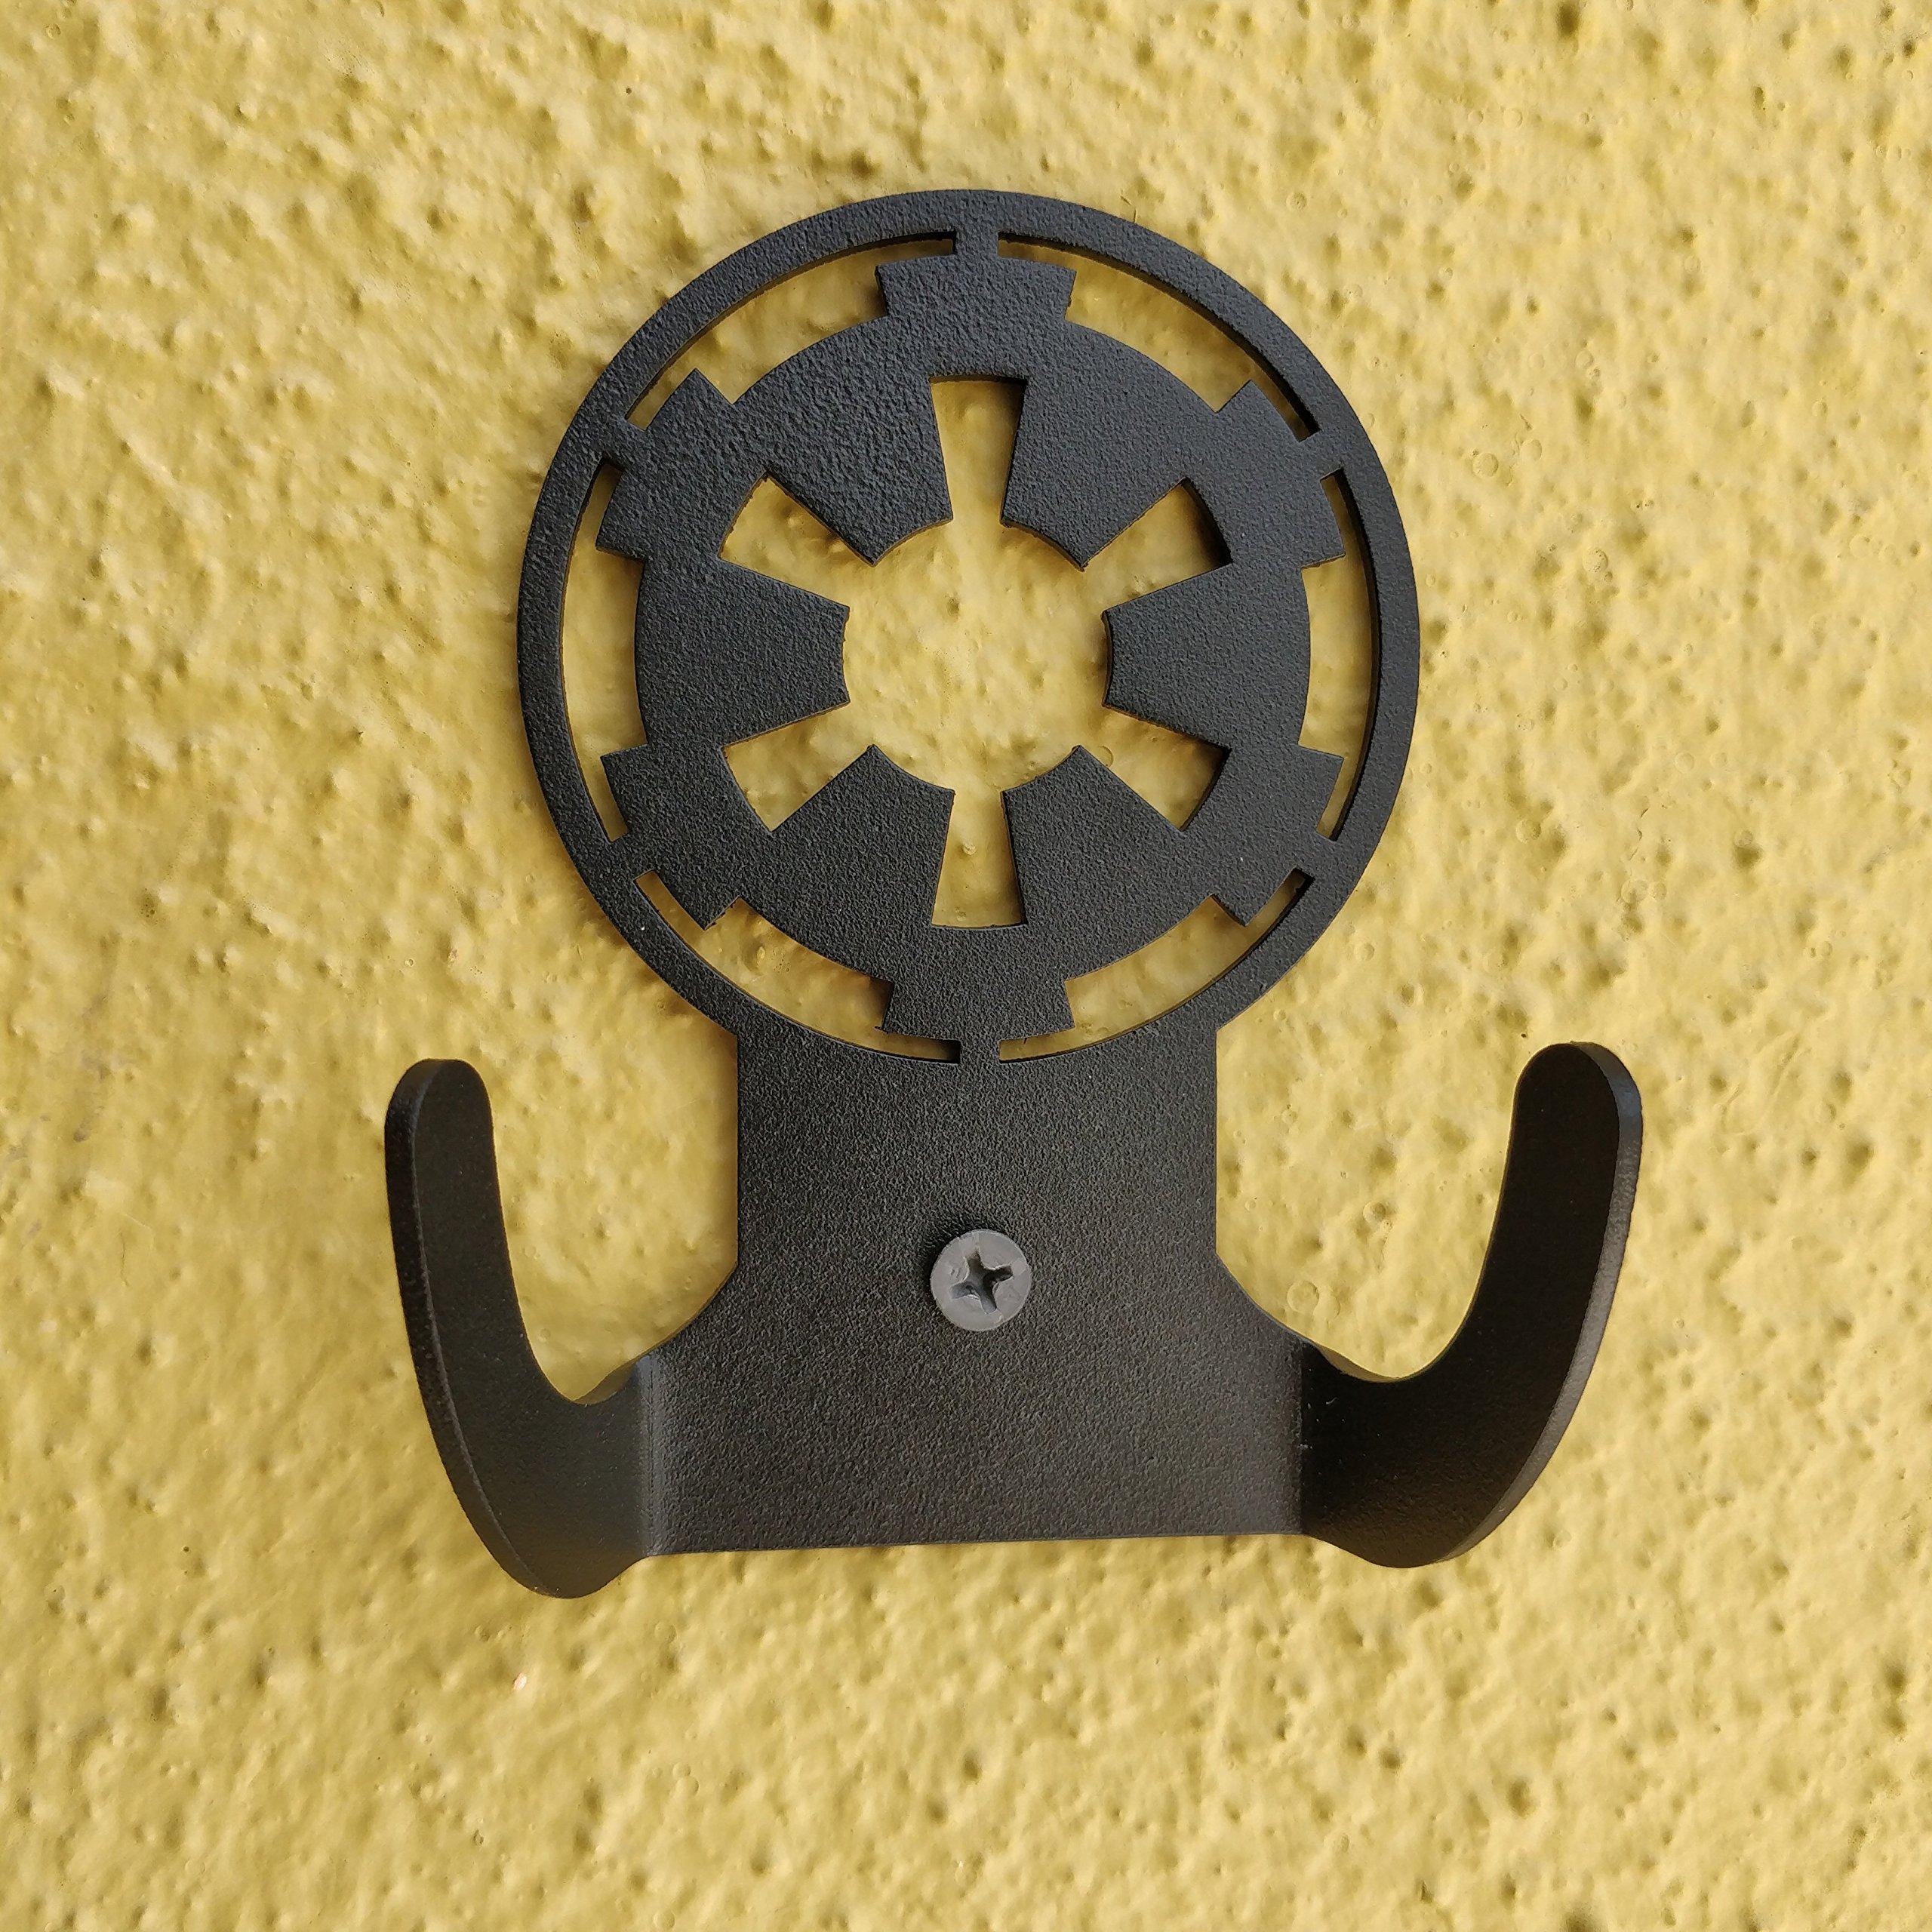 HeavenlyKraft Star Wars Logo Steel Wall Hook Dual Holder For Living Room Coat Hat Robe Hanger Bathroom Towel Kitchen Strong Heavy Duty Garage Storage Organizer Utensil Hook Single, 4 X 3.14 X 1.4 Inch